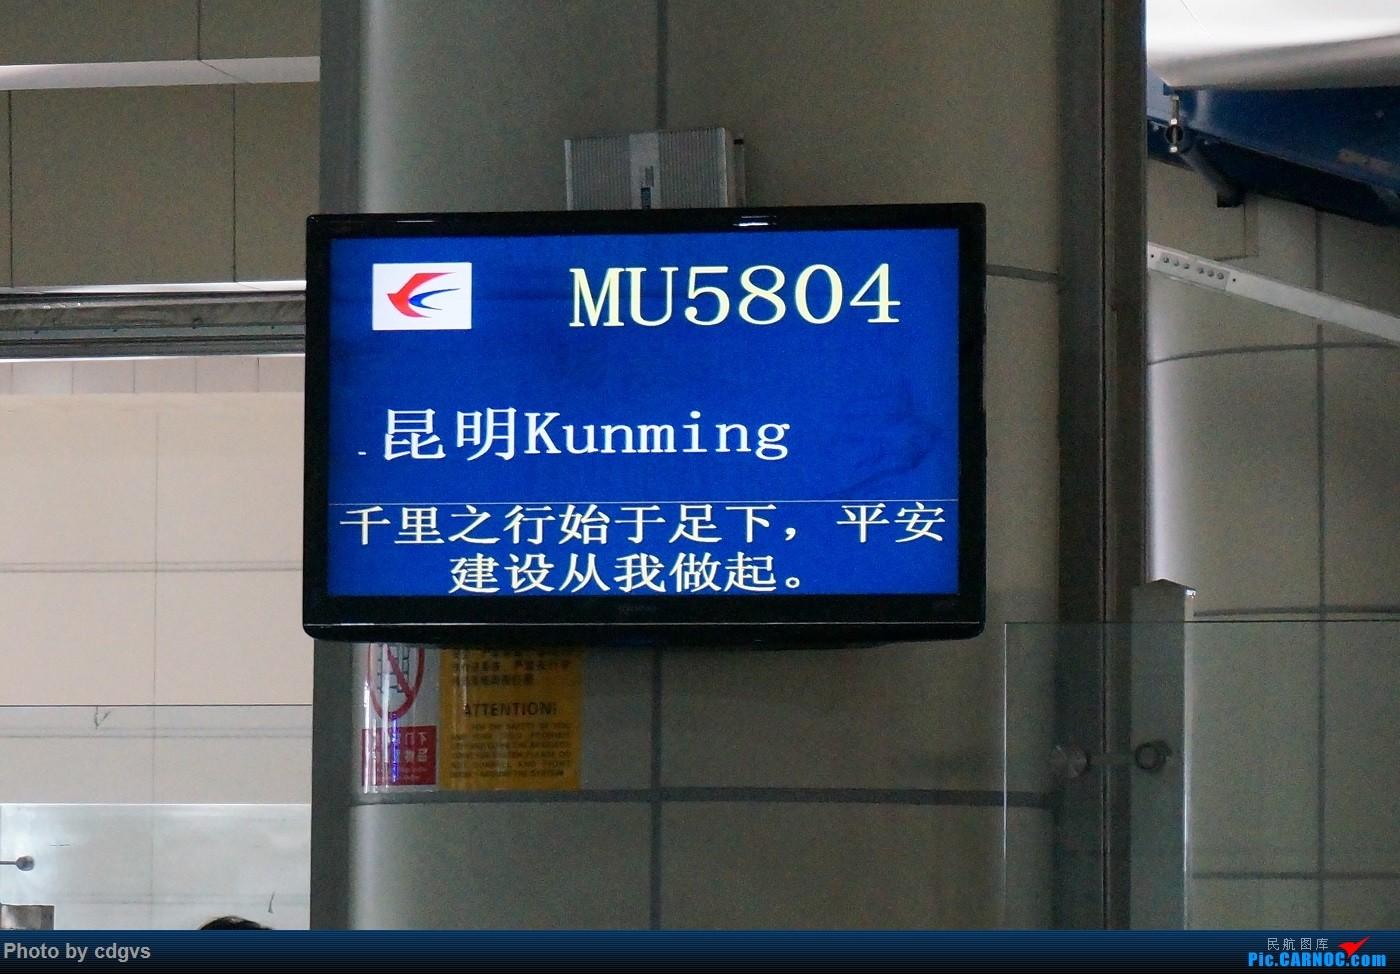 Re:[原创]KMG-LJG-KMG 东航&南航 省内刷航段,飞空客波音两种不同机型 EMBRAER LEGACY 650 B-3280 中国丽江三义机场